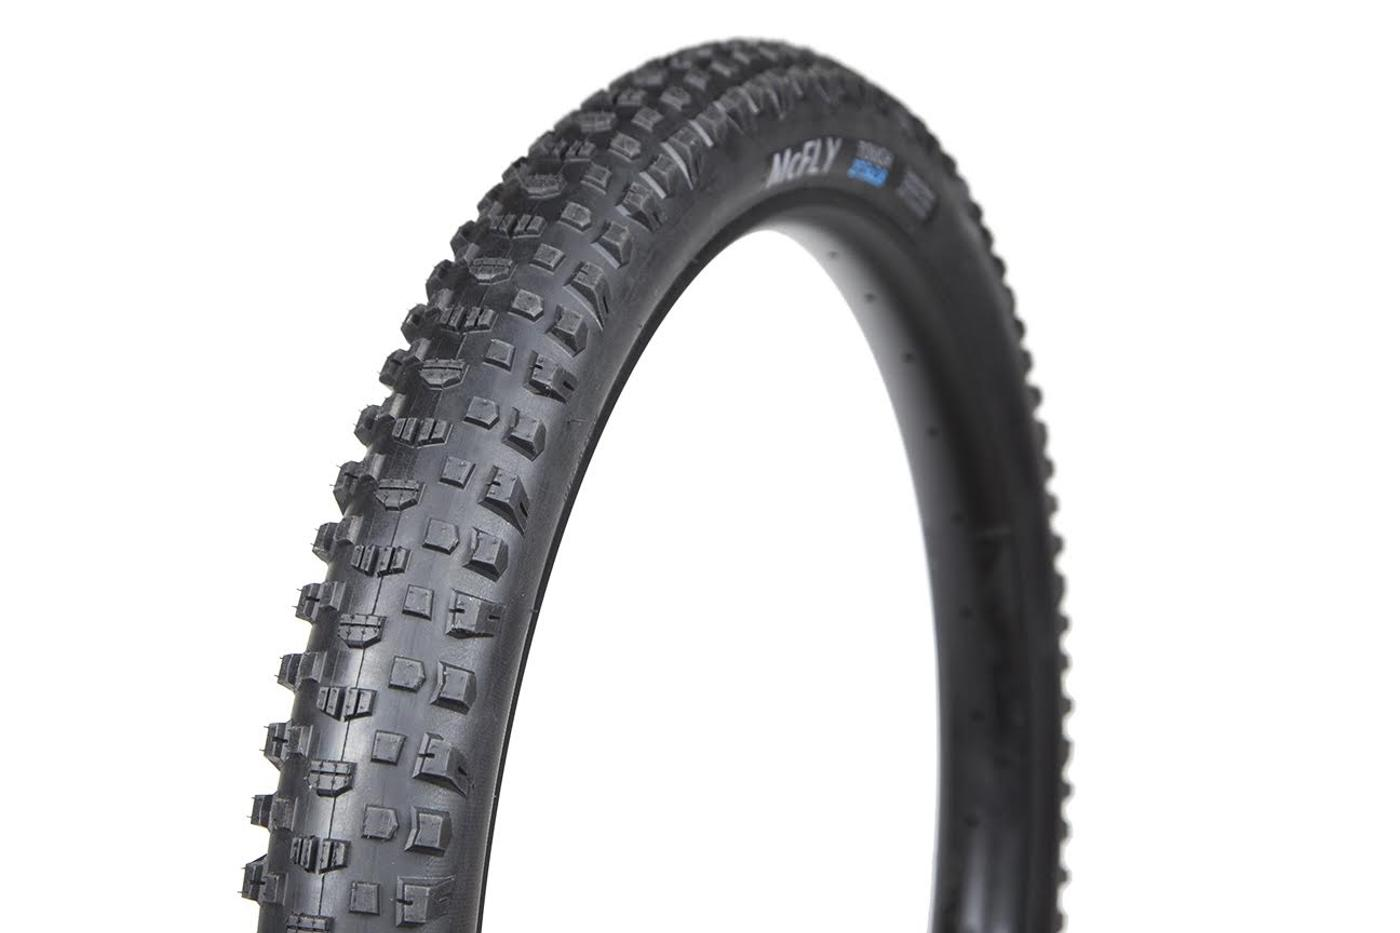 Terrene's New McFly 2.8″ Tire